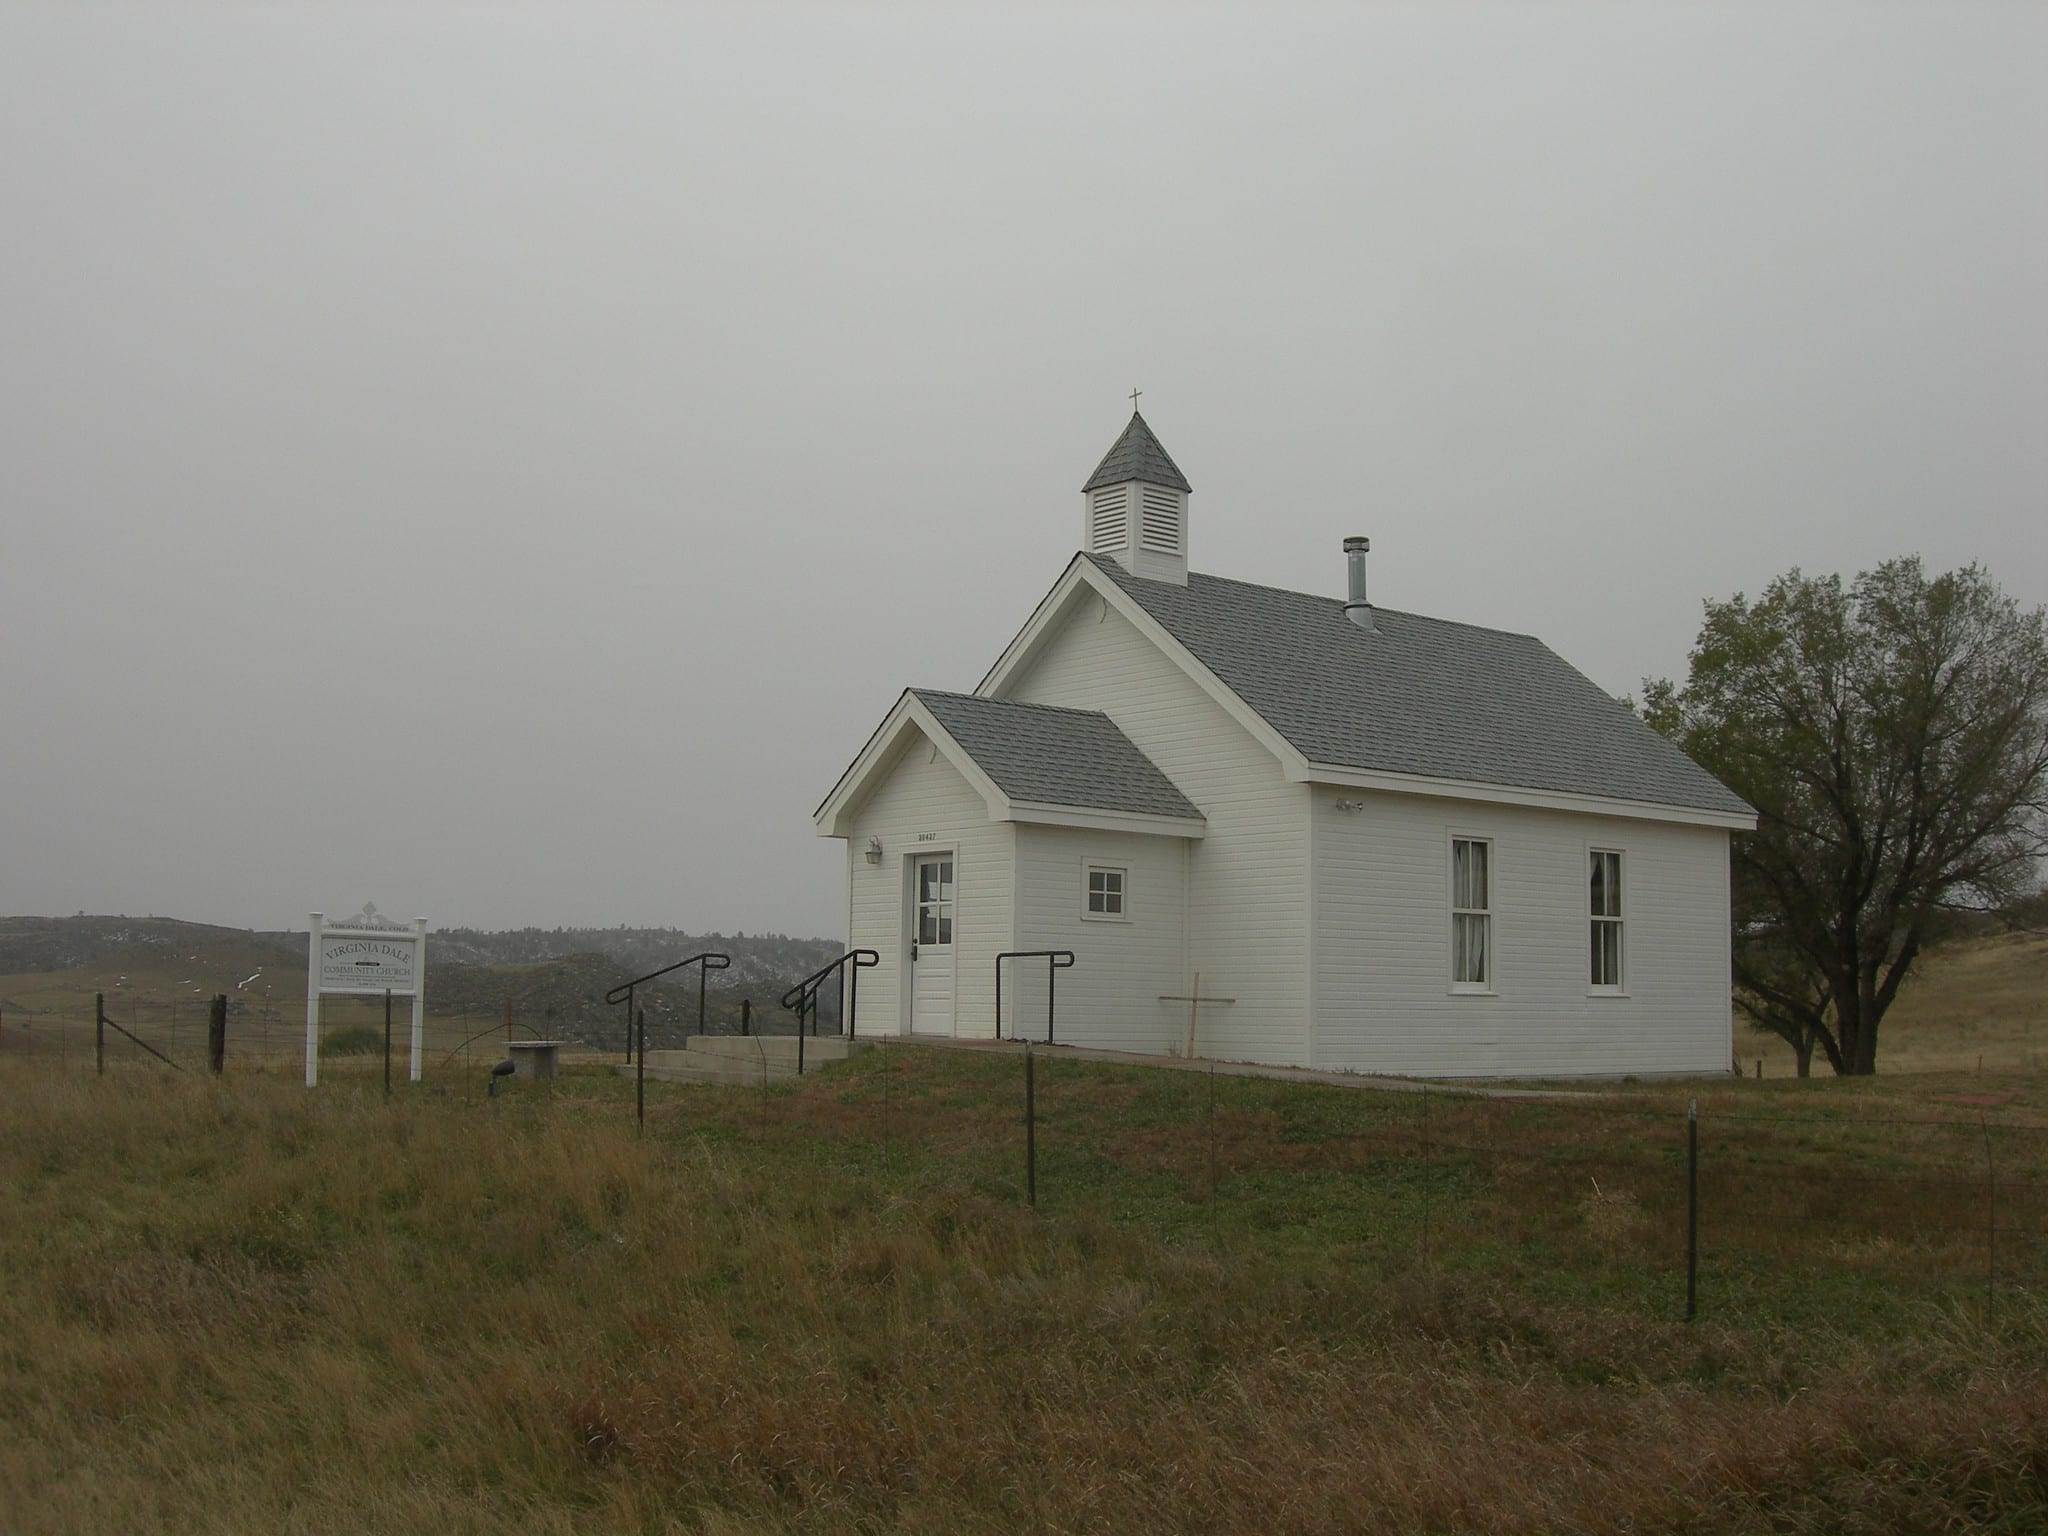 image of church in Virginia Dale